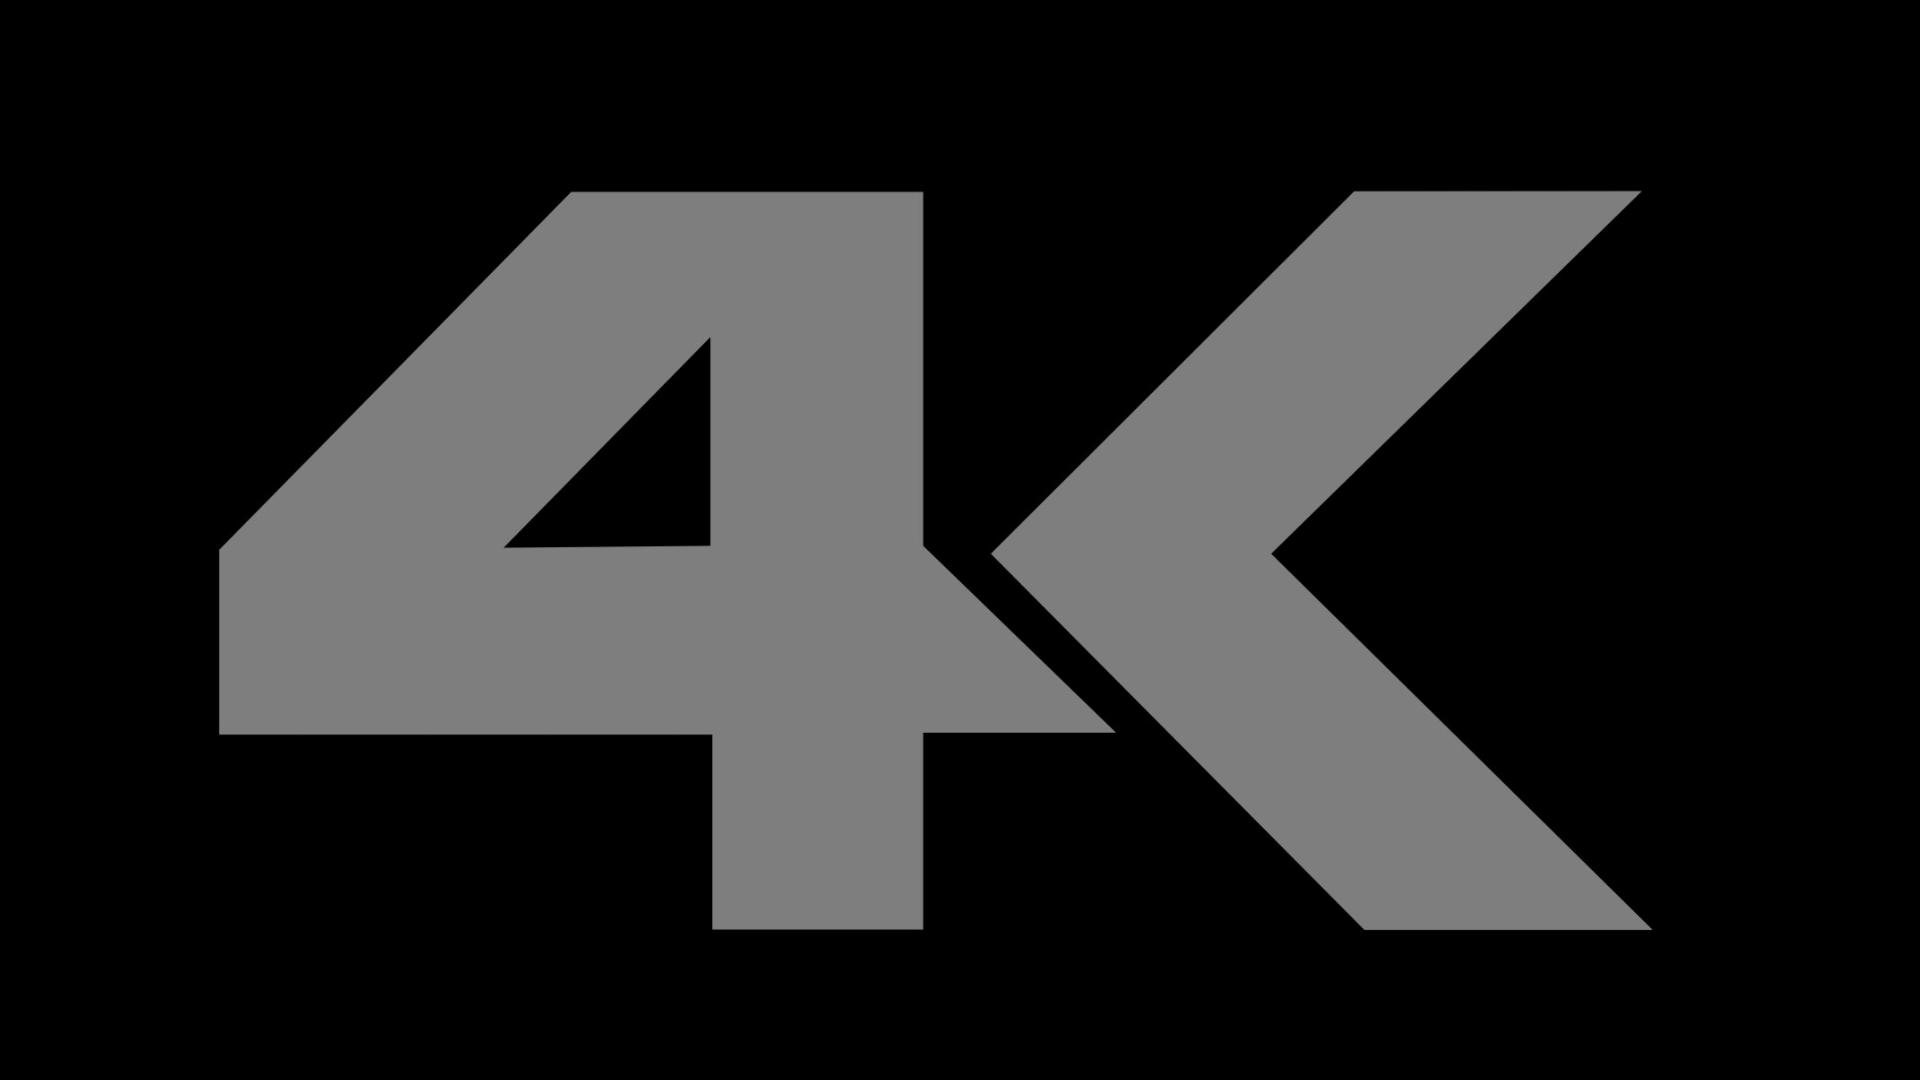 banda 4K